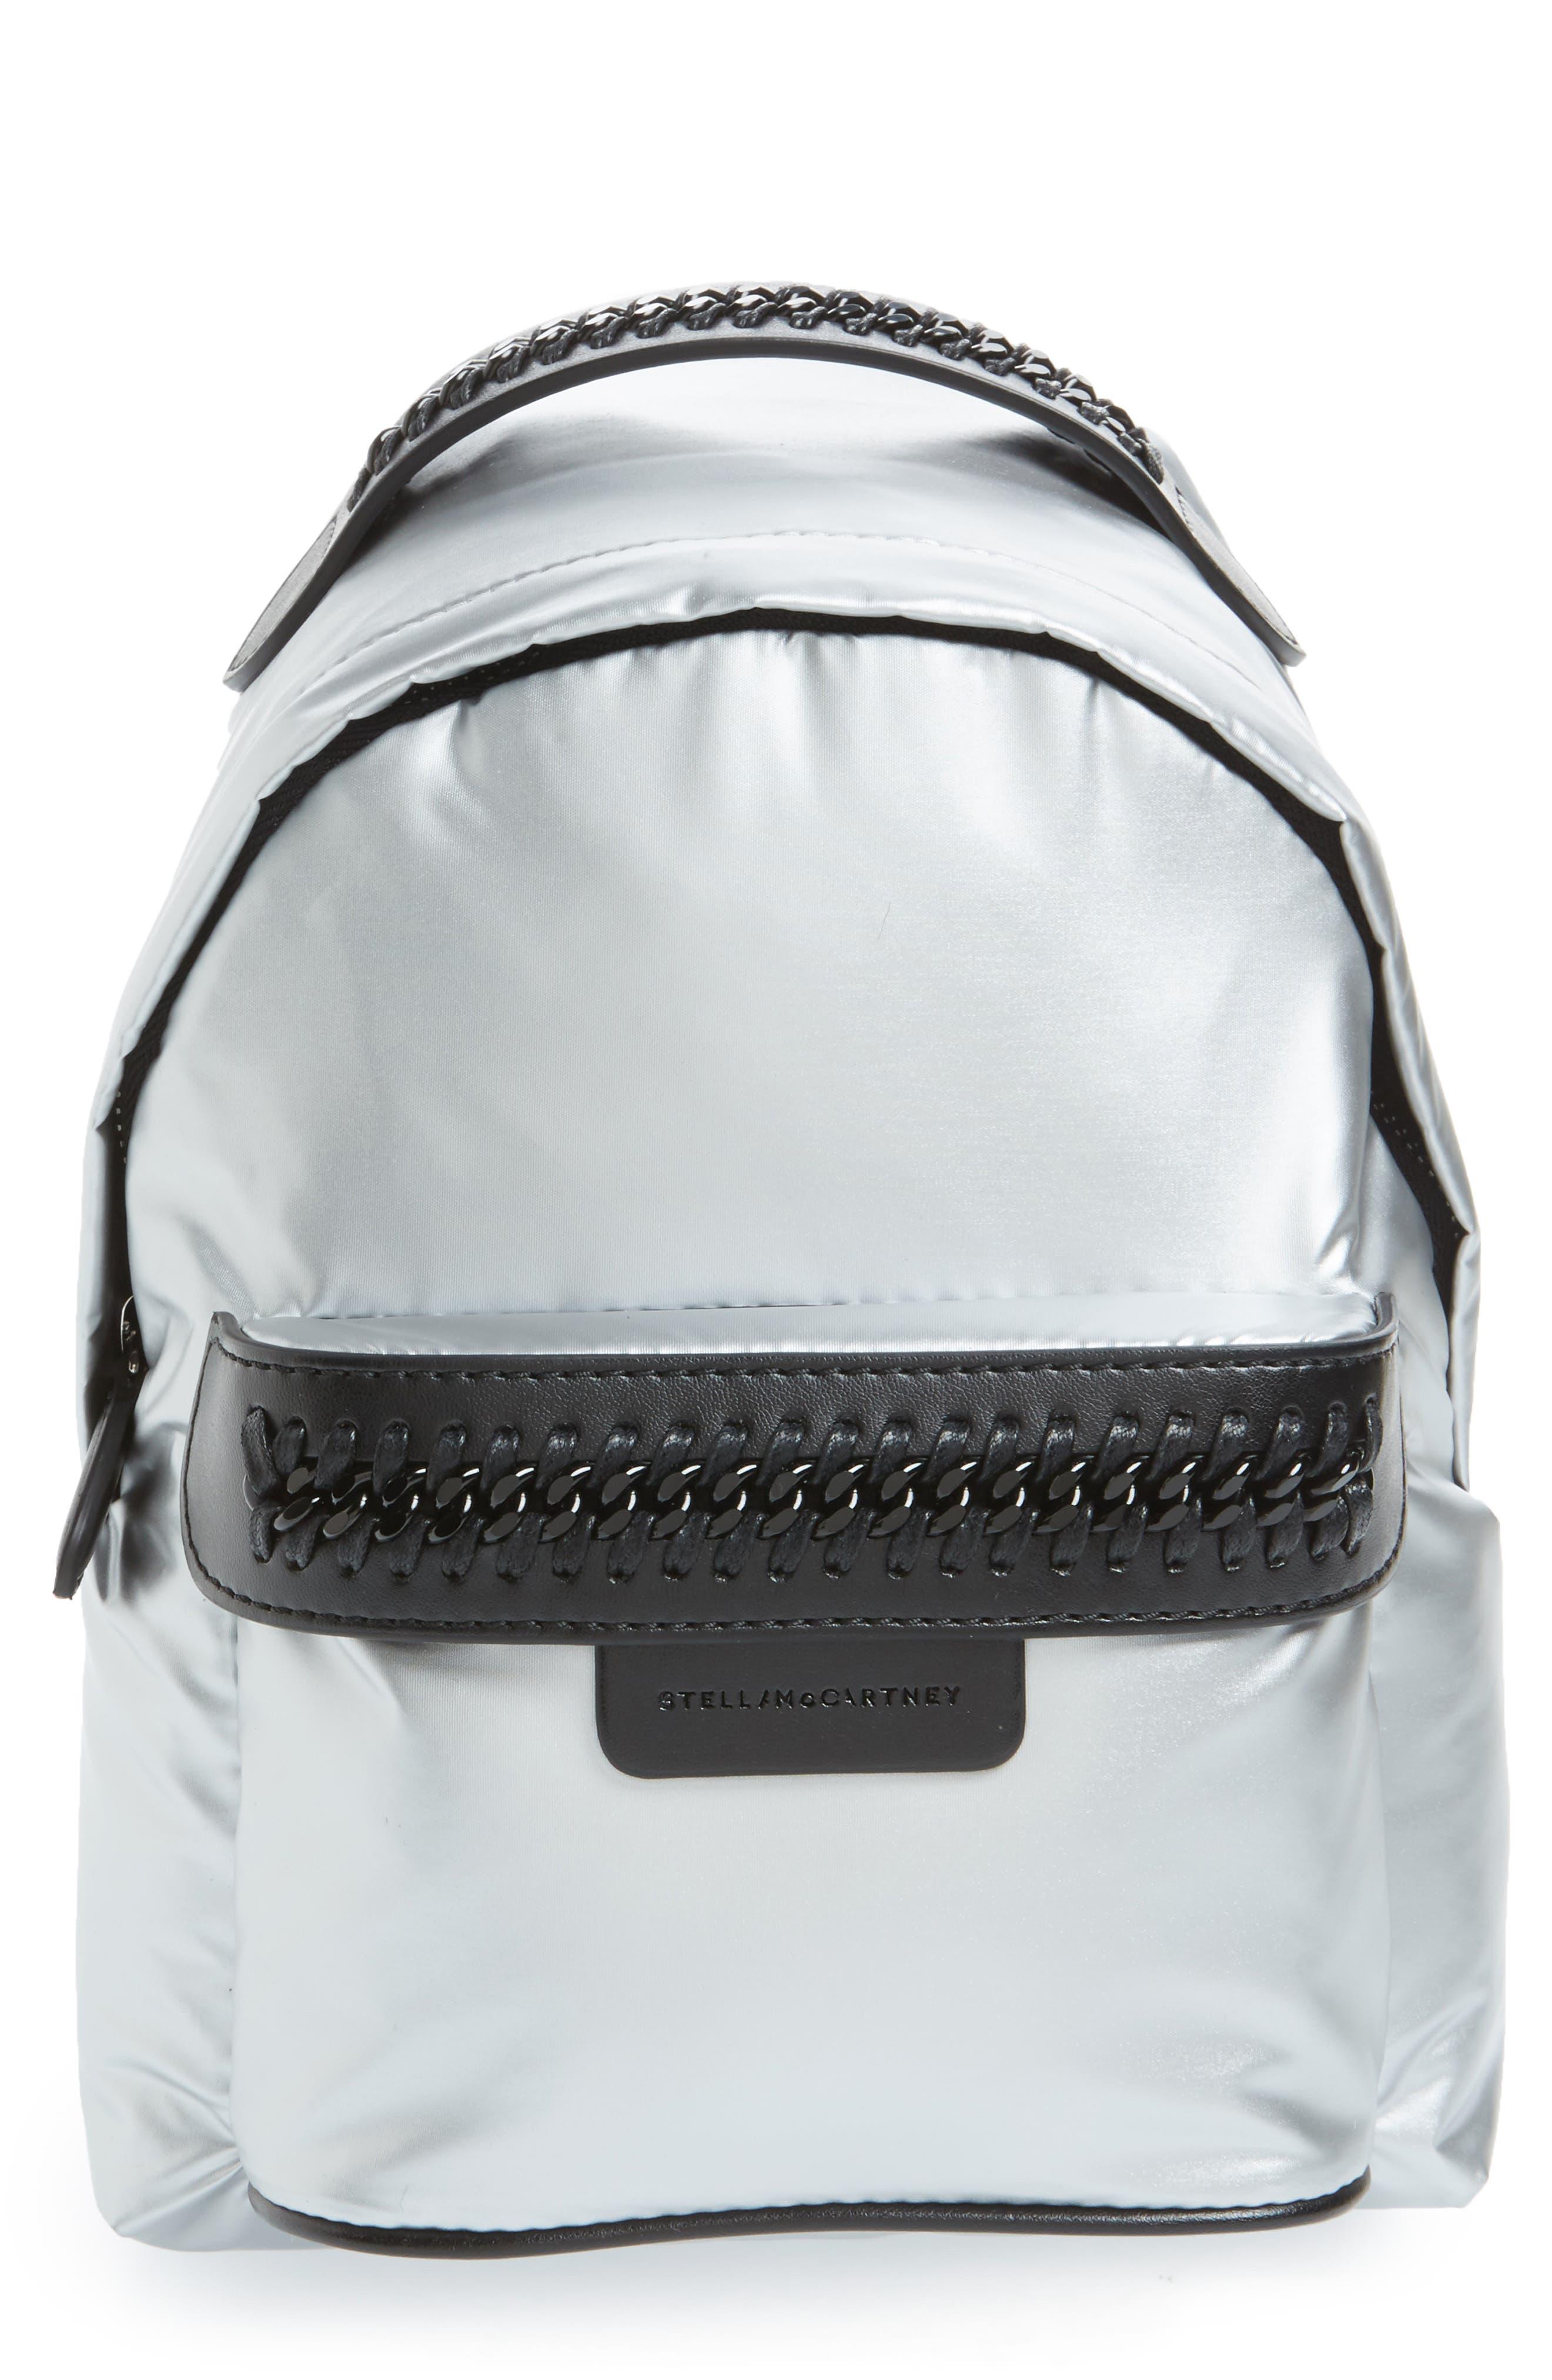 Stella McCartney Mini Metallic Nylon Backpack